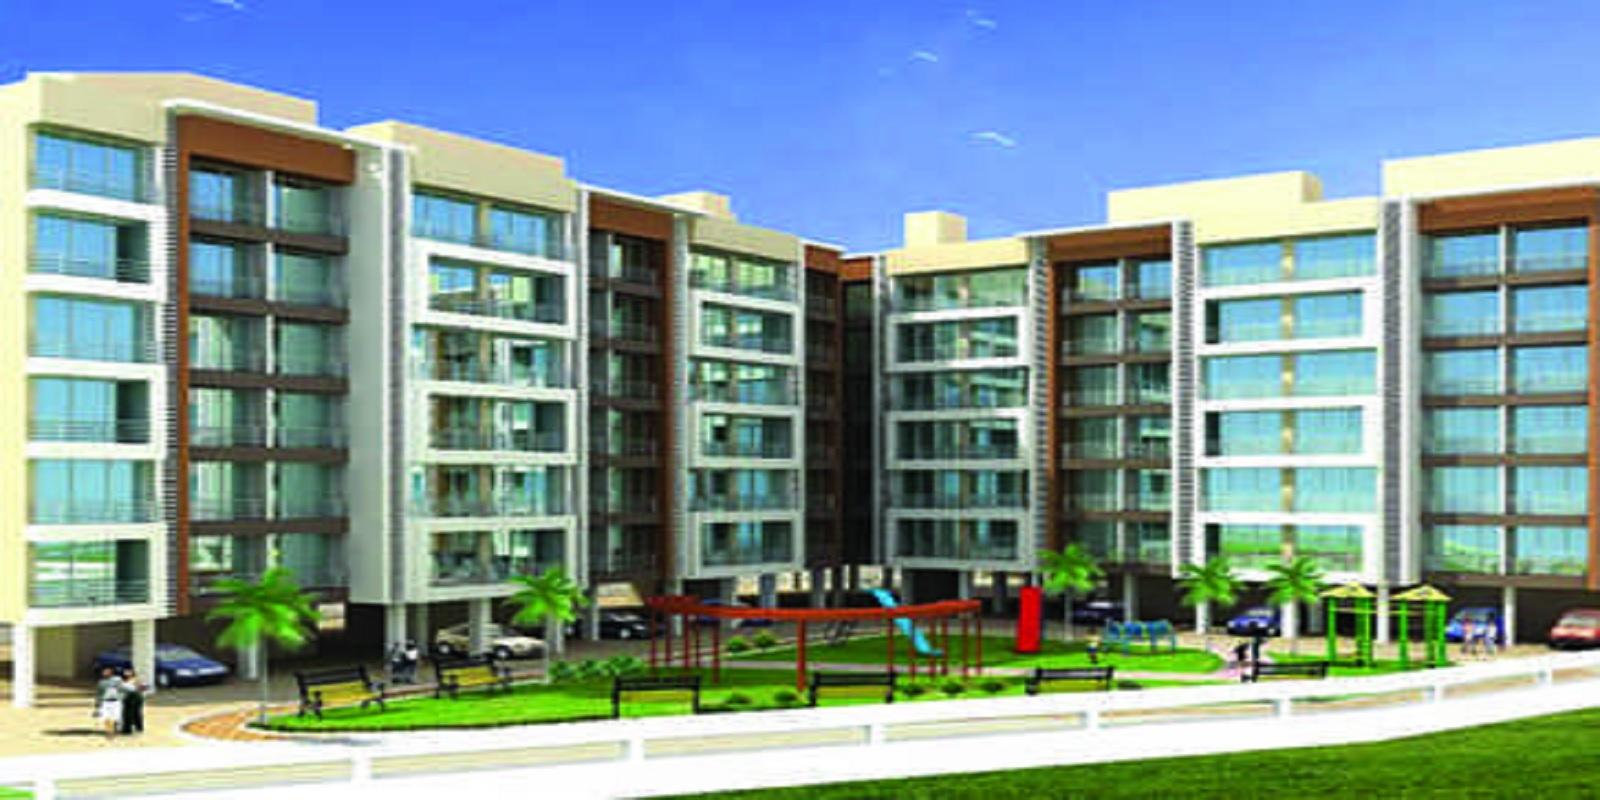 kanag samarpan city project project large image1